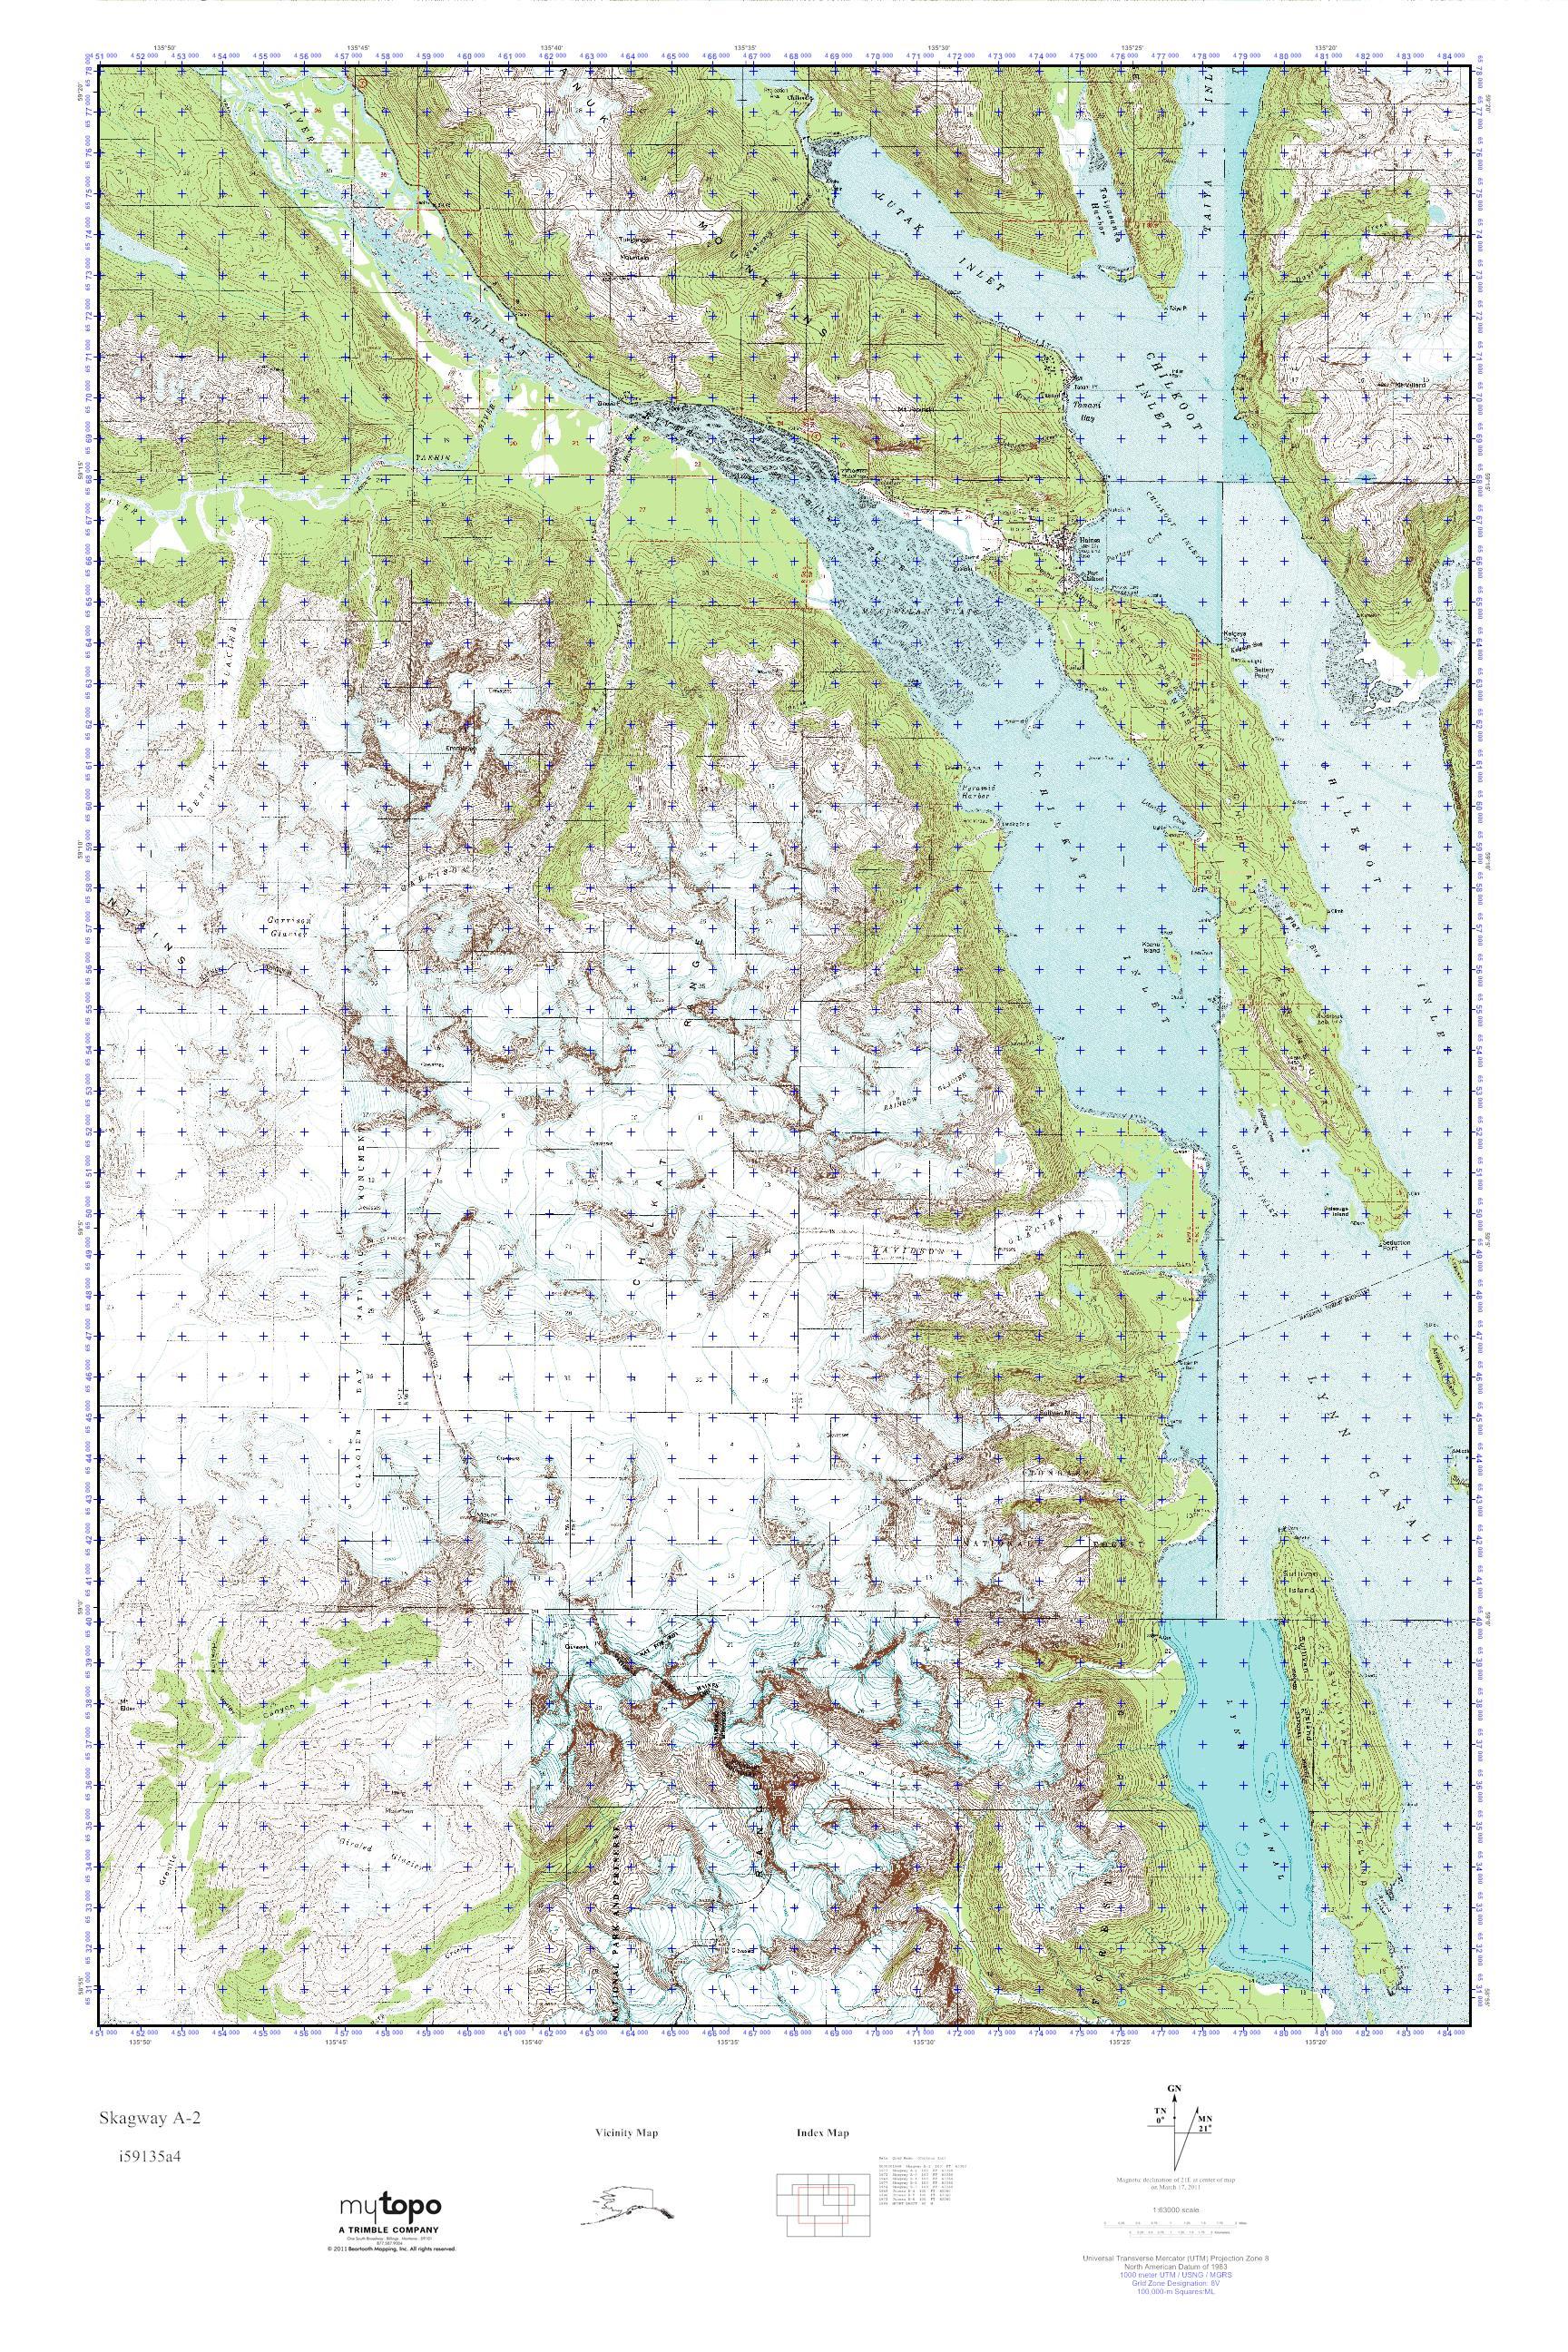 MyTopo Skagway A-2, Alaska USGS Quad Topo Map